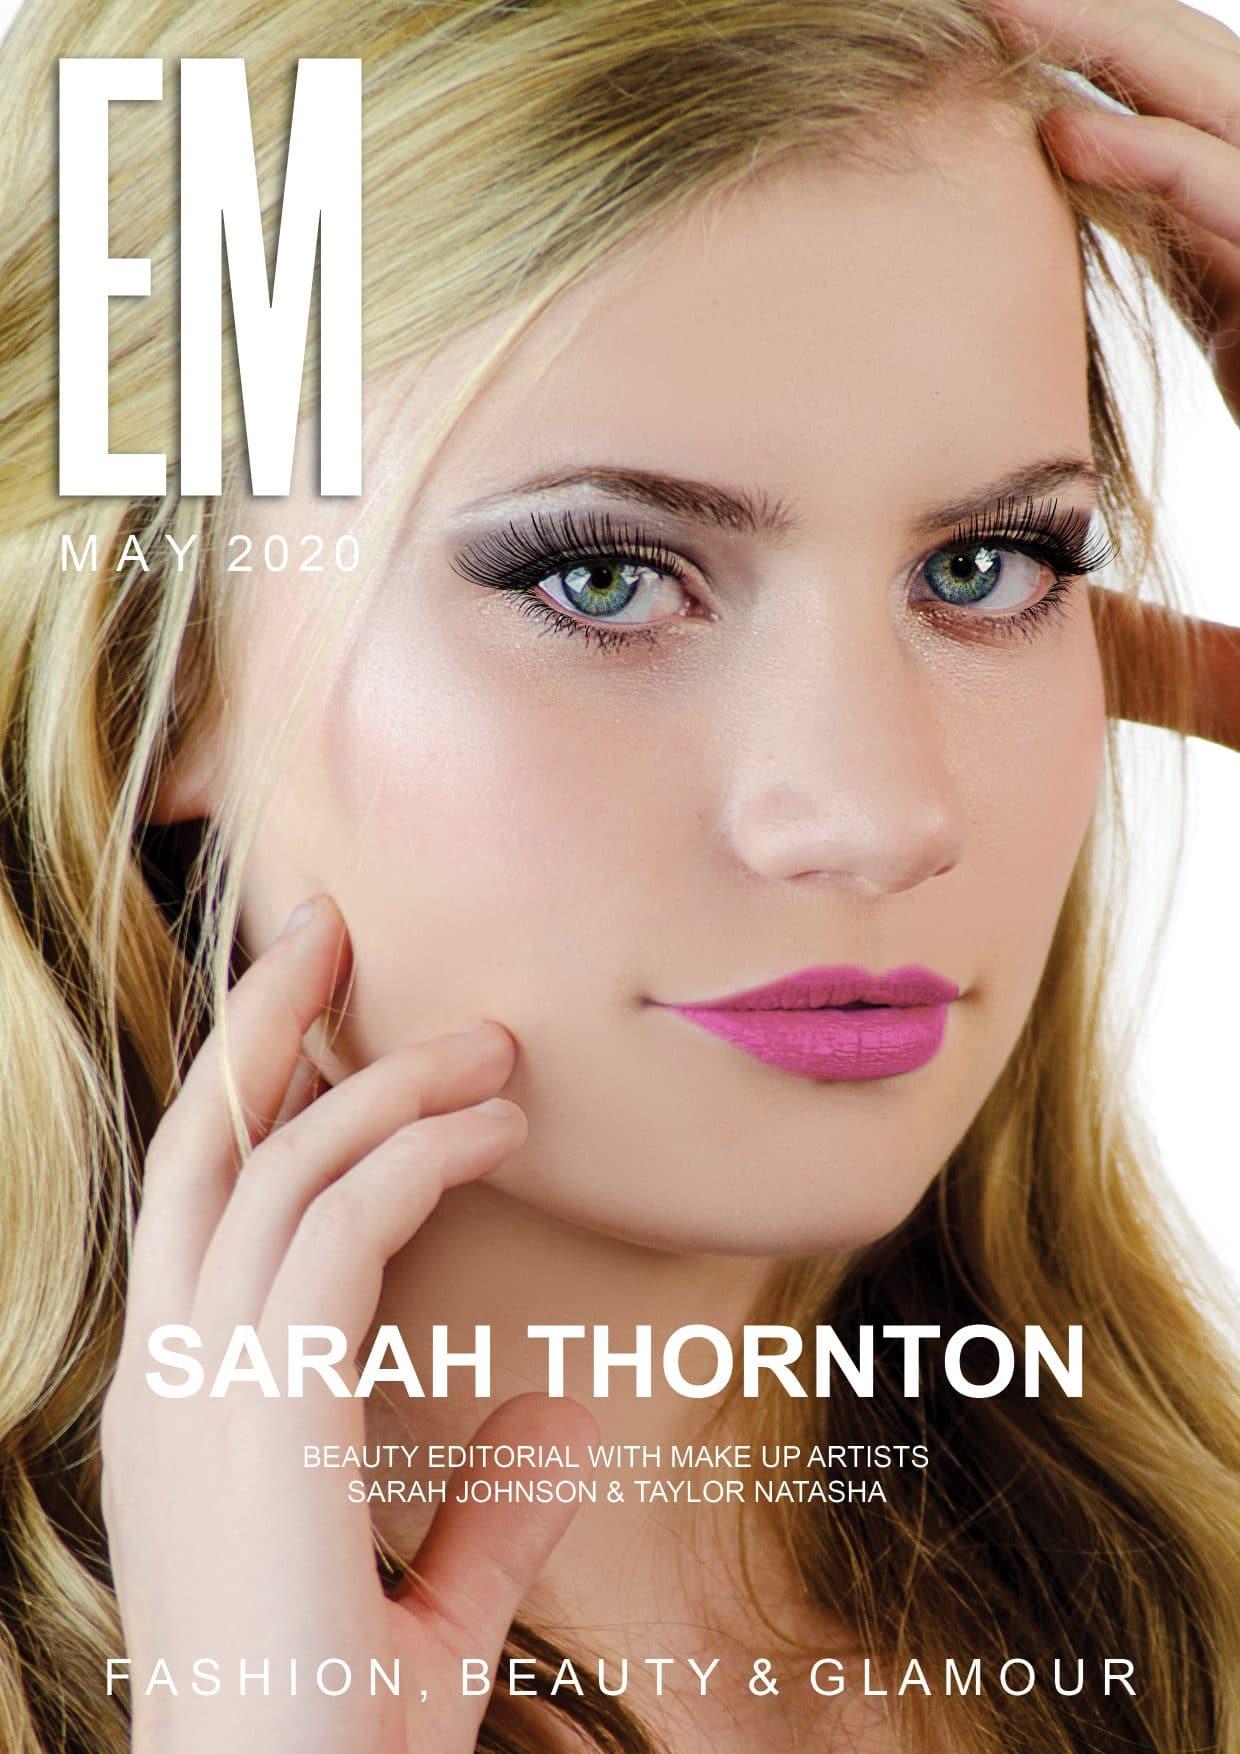 EM Magazine - May 2020